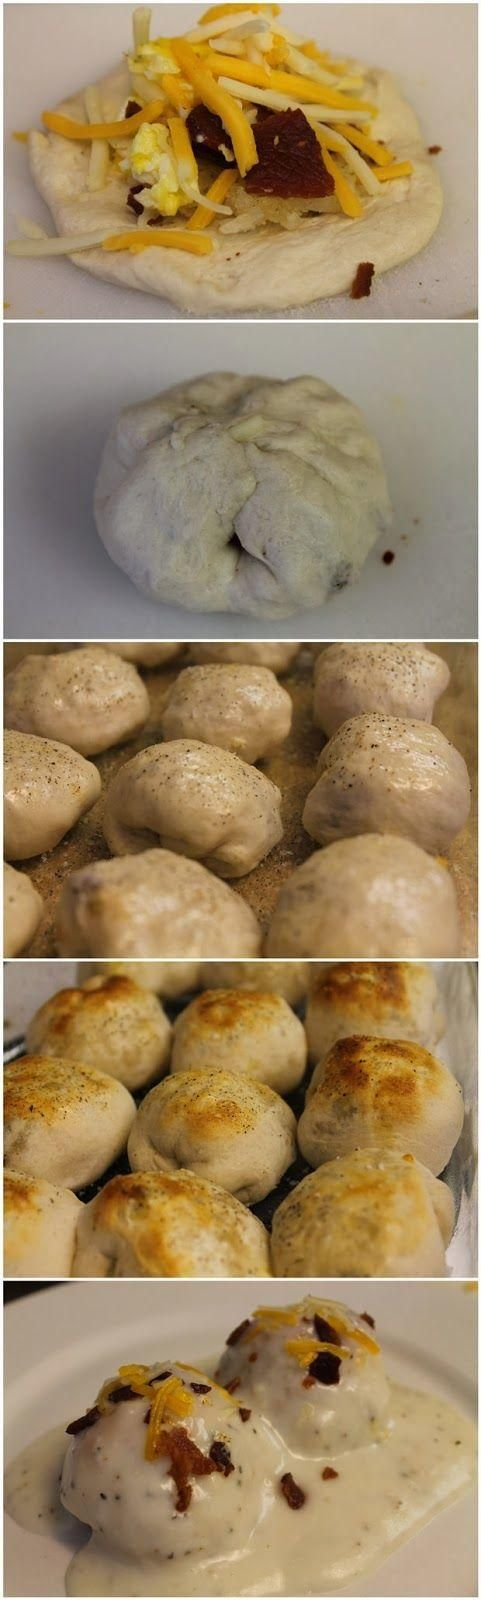 Stuffed Breakfast Bubble Biscuits #pillsbury